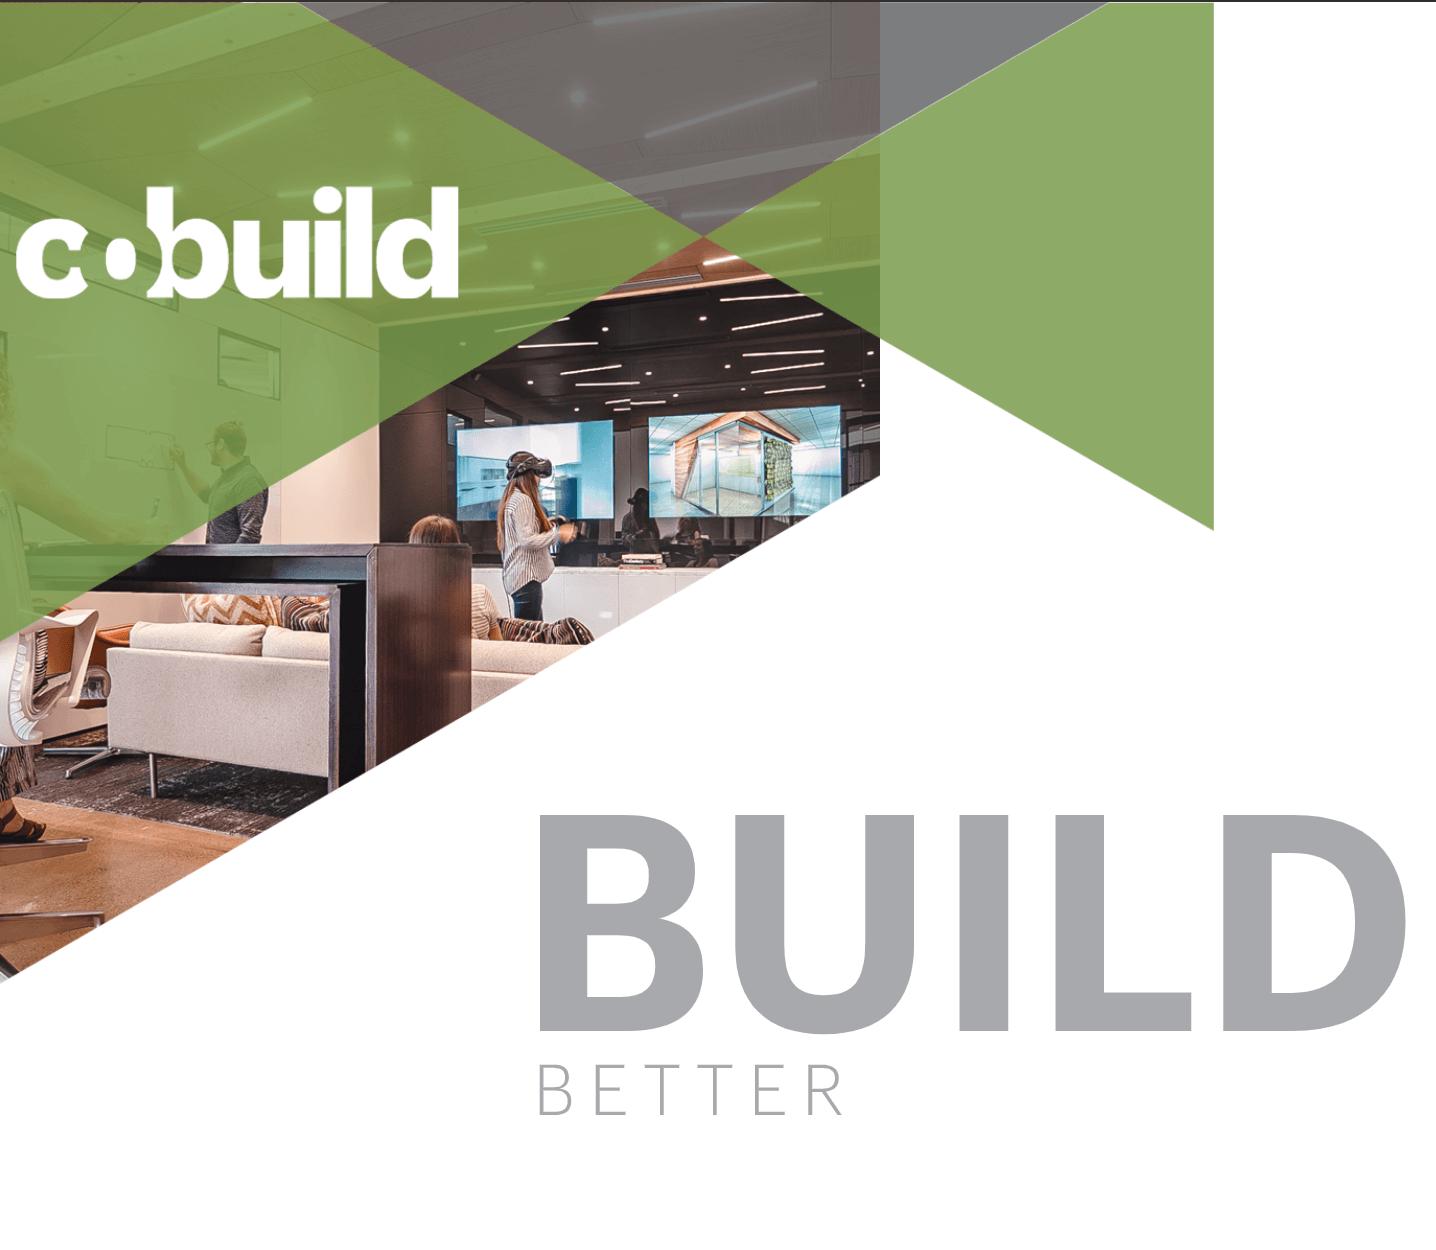 Builditbetter-ebook-coBuild (2)